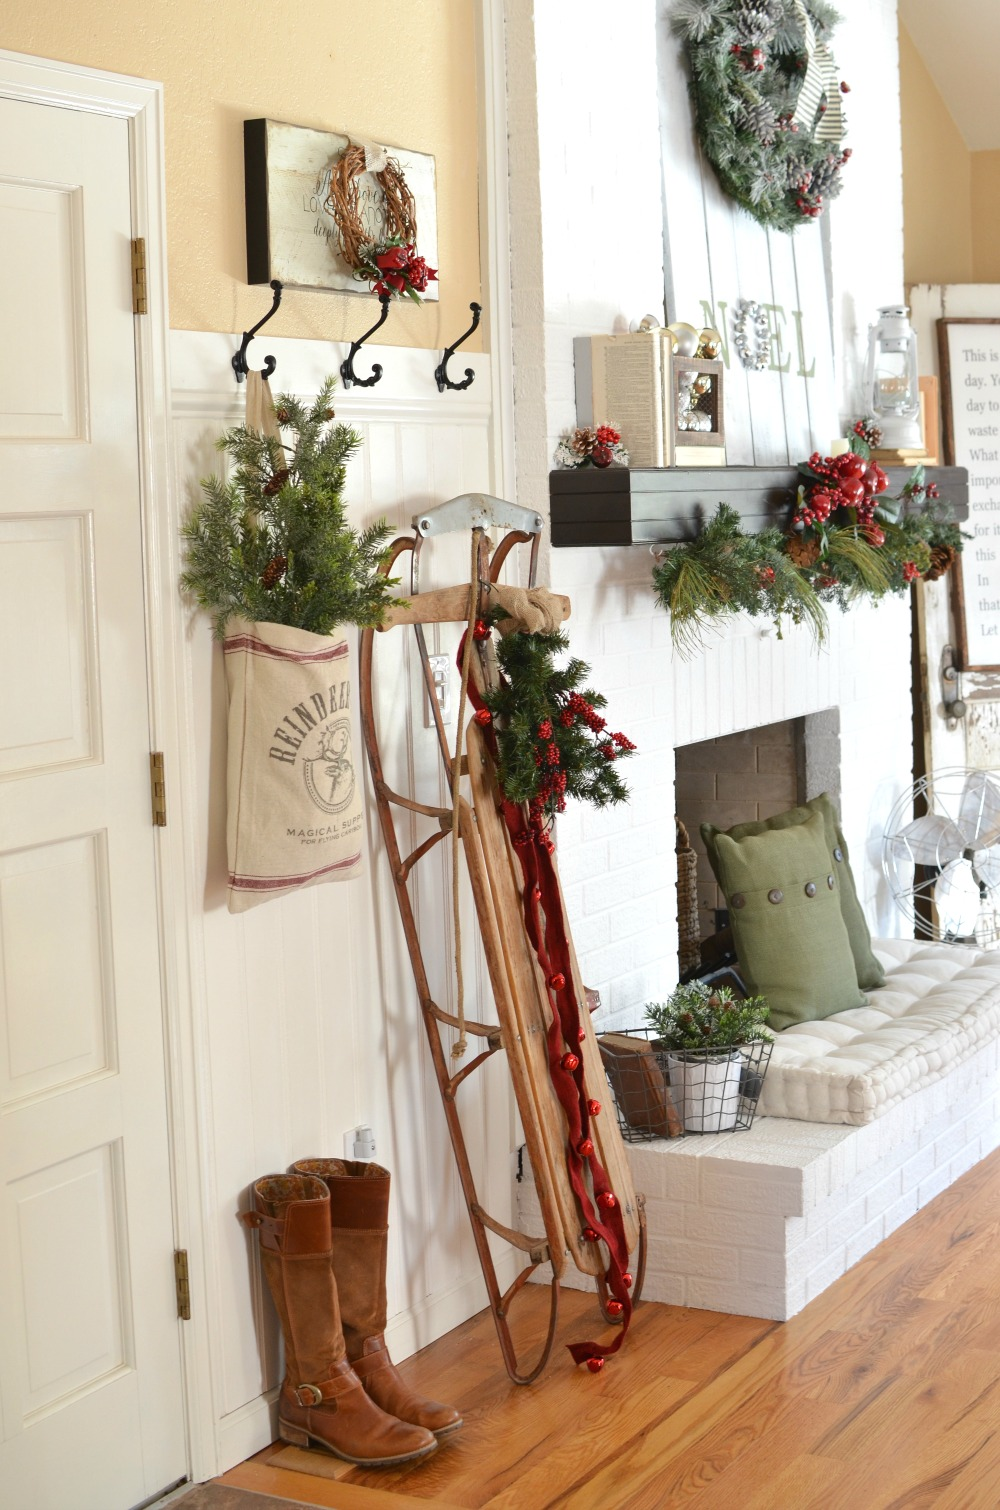 A Vintage Christmas Entryway - Little Vintage Nest